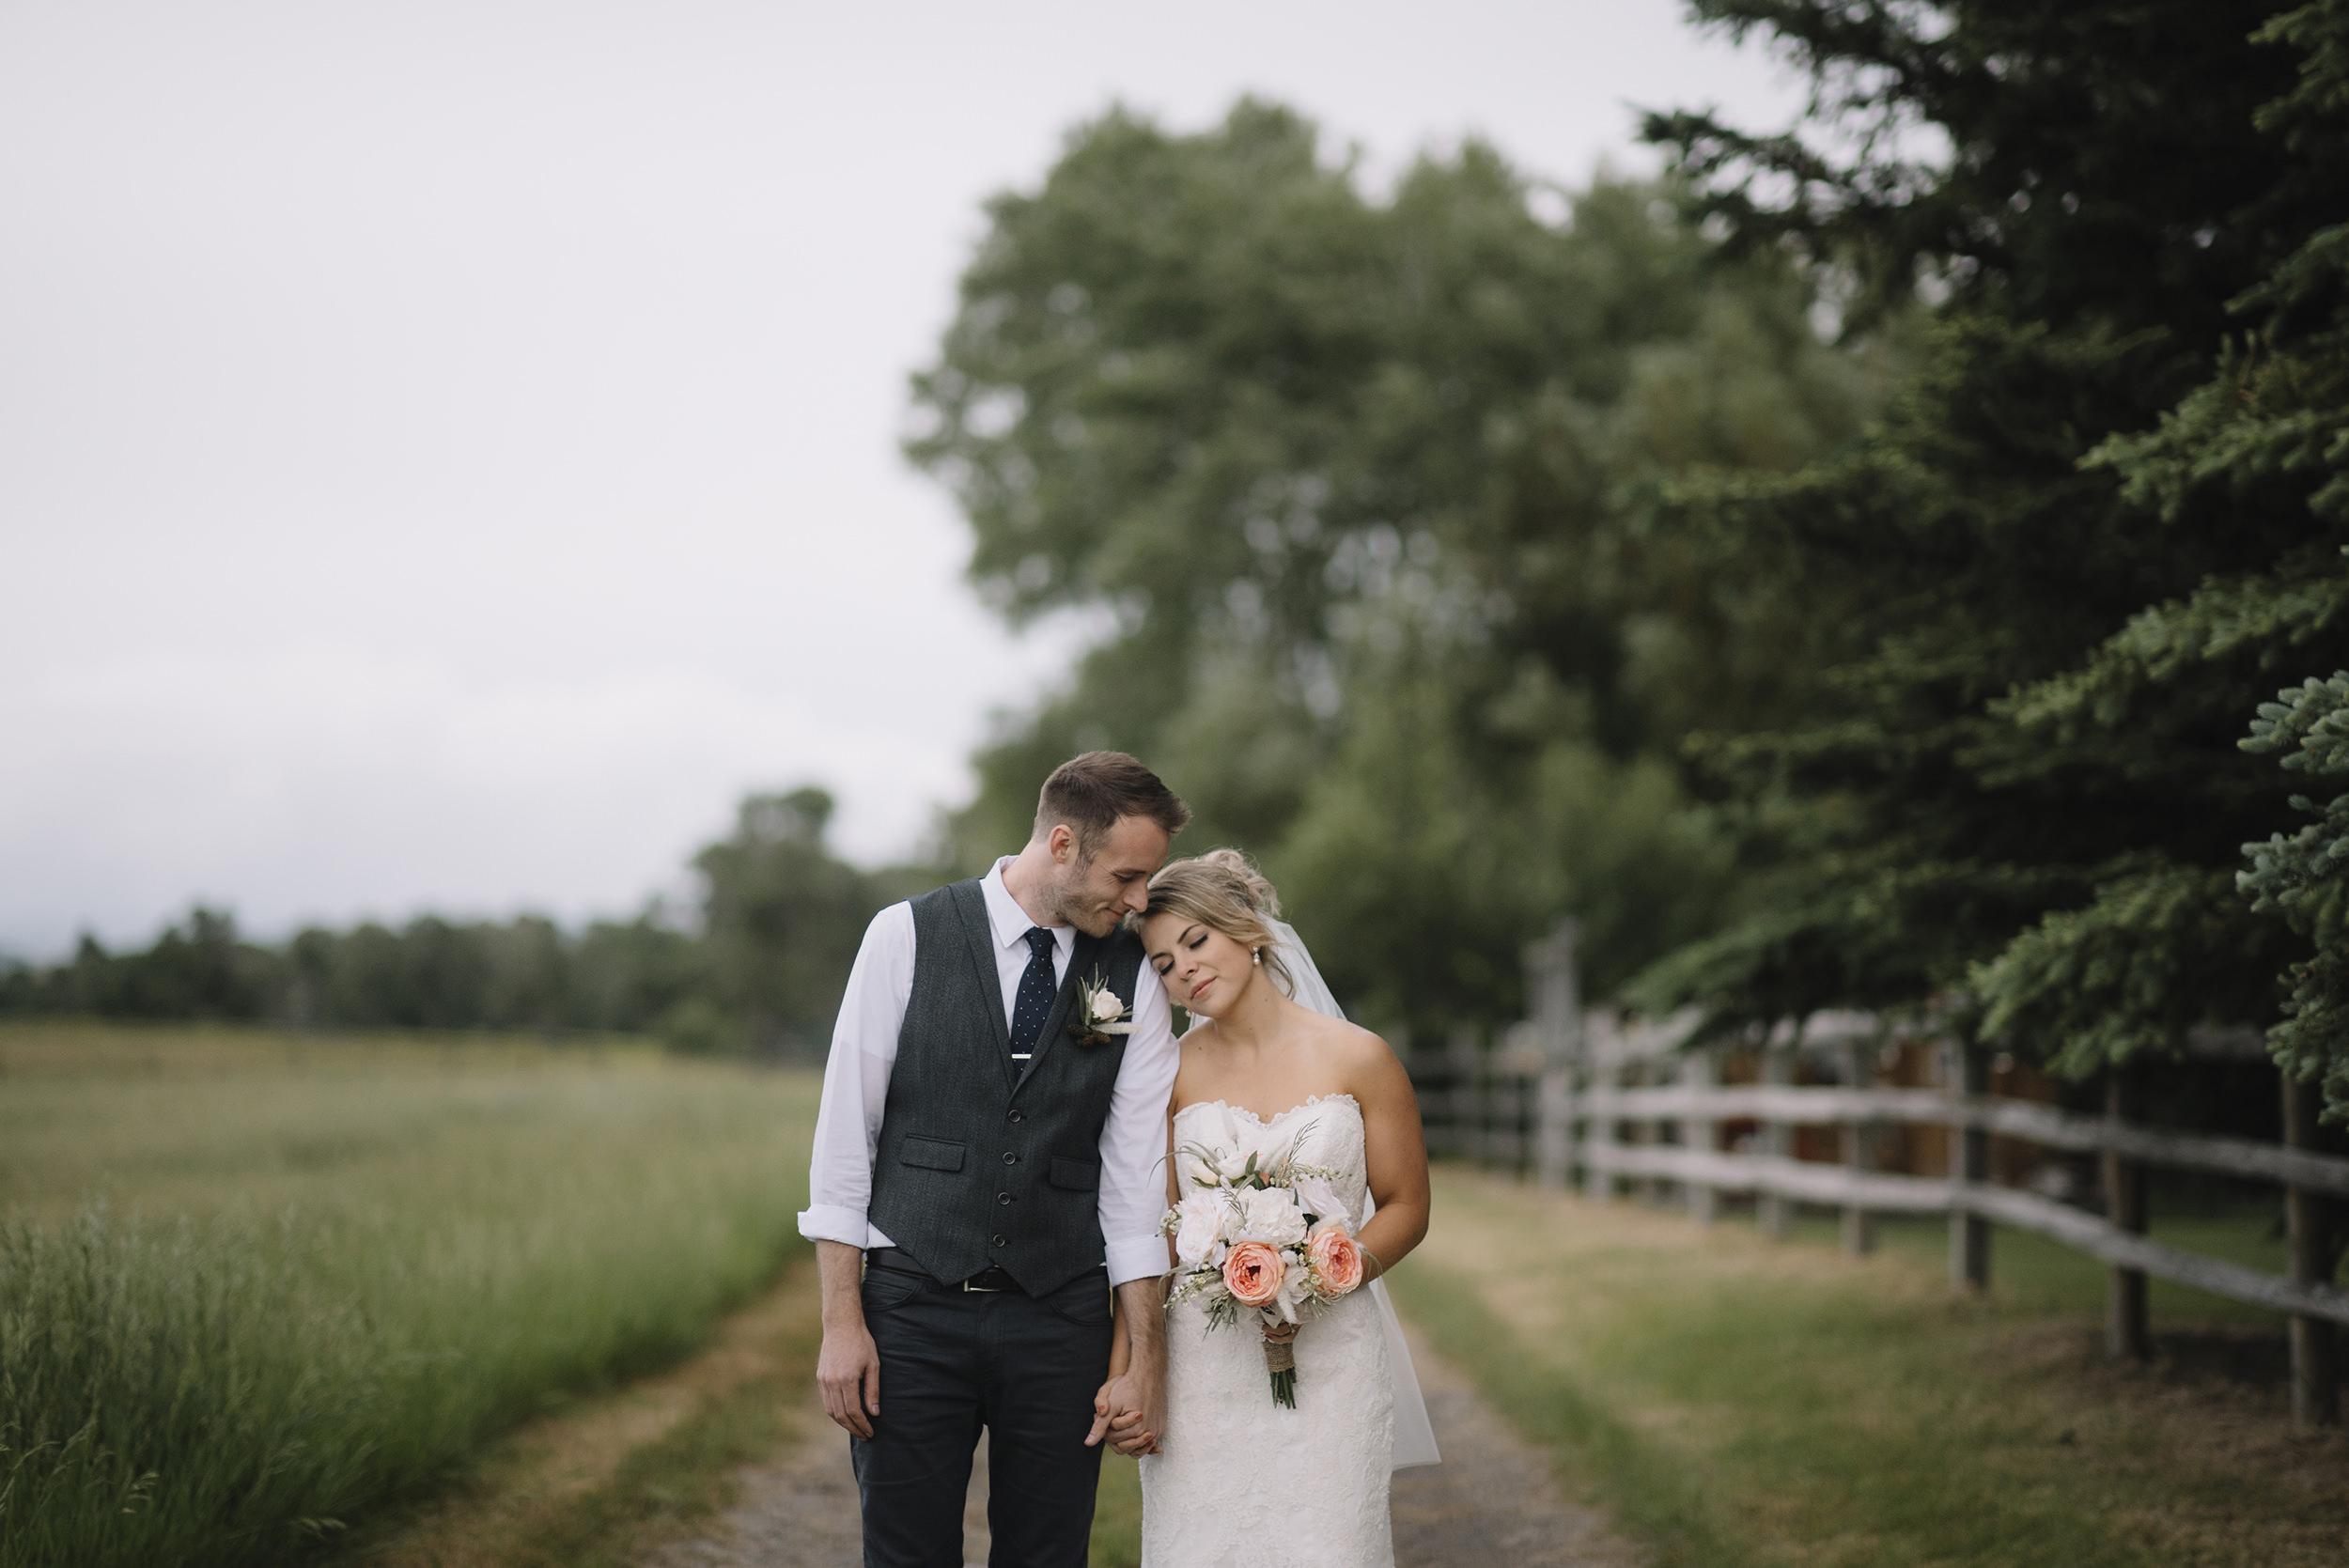 Colby-and-Jess-Intimate-Backyard-Wedding-Bozeman-Montana267.jpg